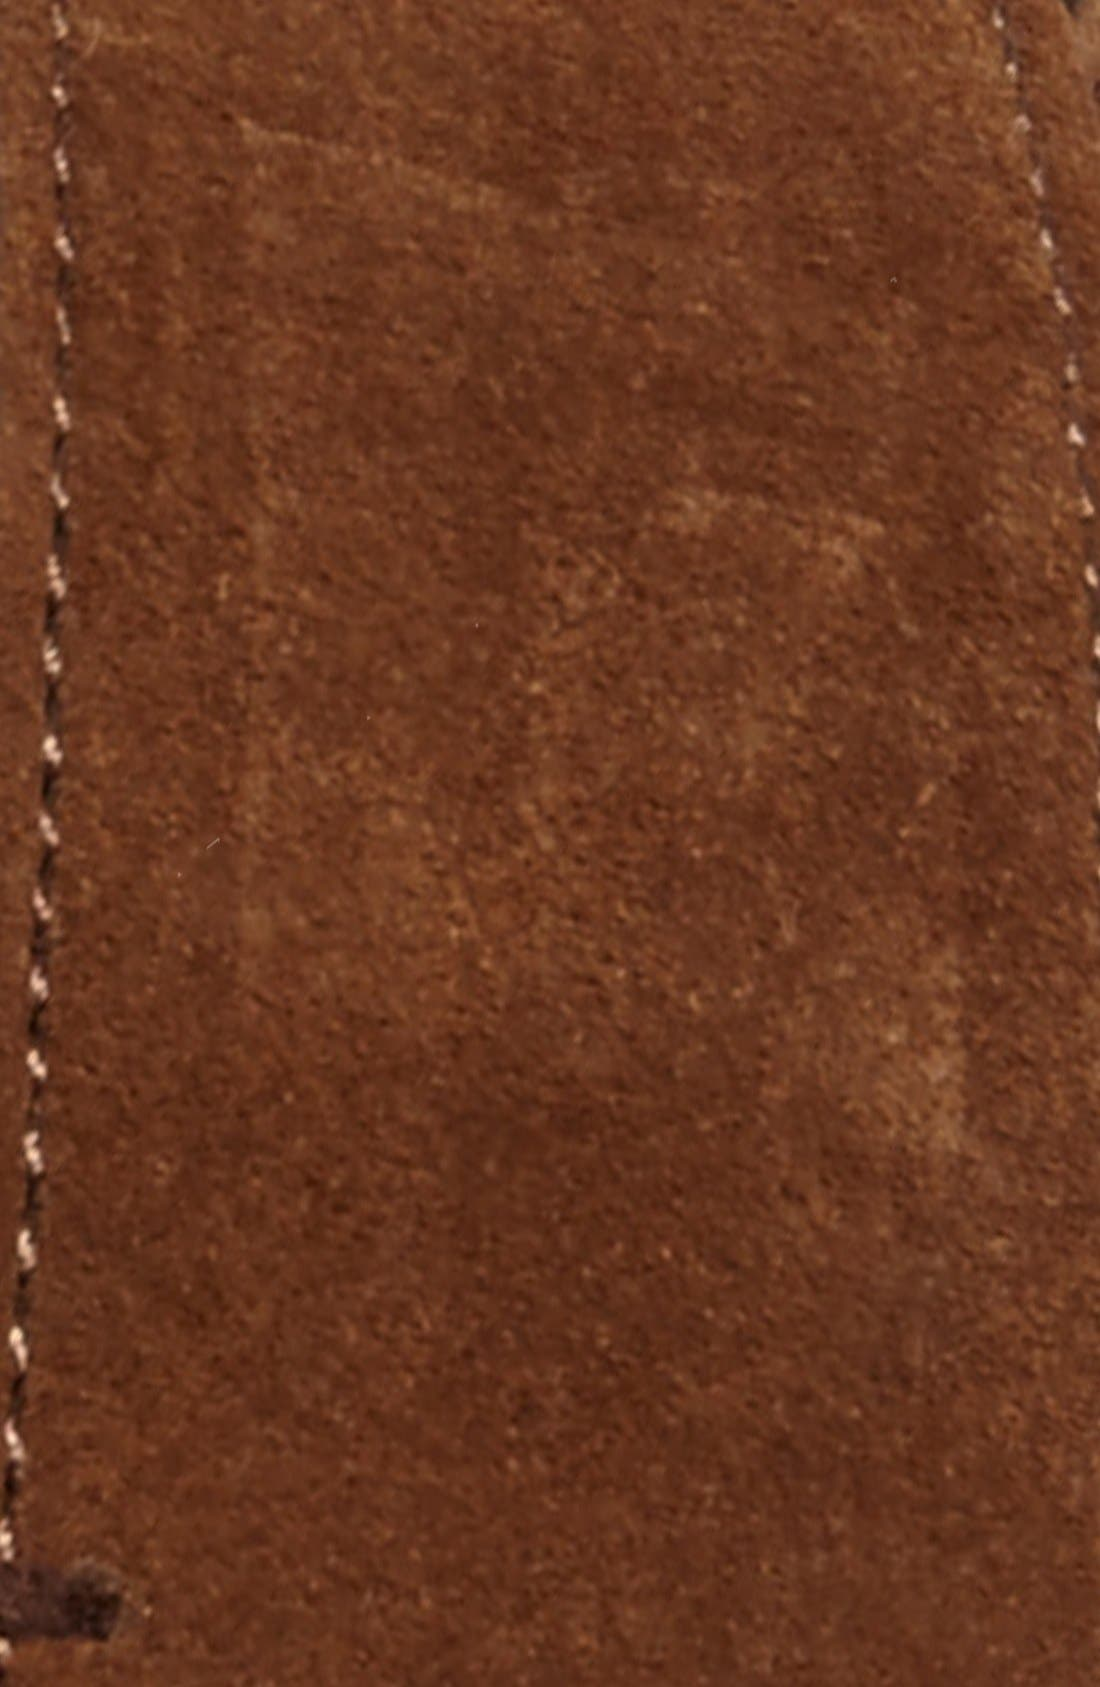 Alternate Image 2  - Polo Ralph Lauren 'Heritage' Belt